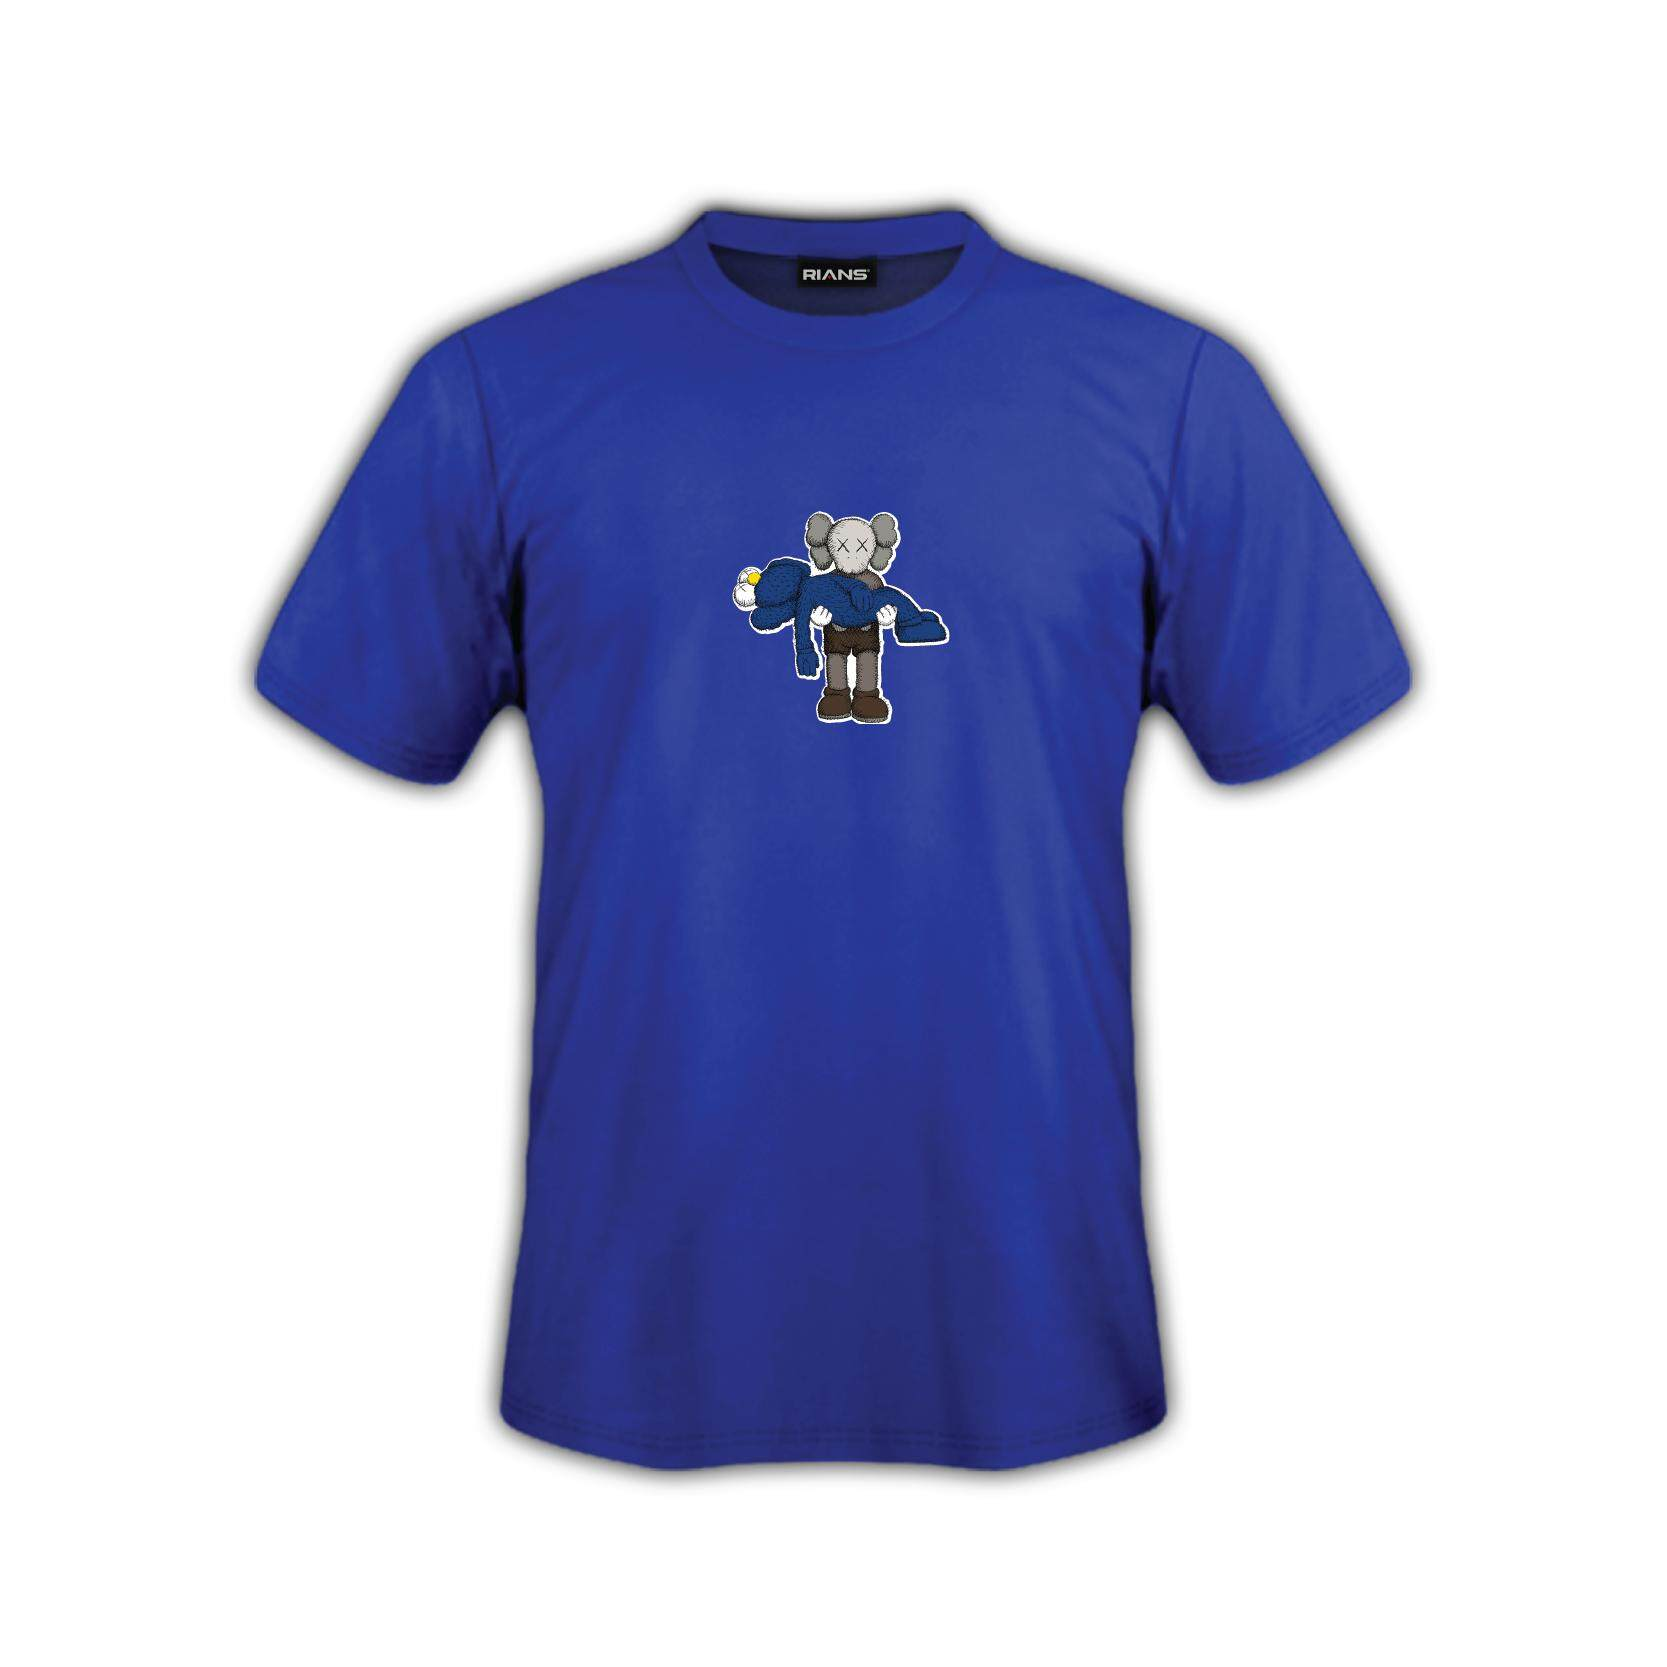 T-Shirt KAWS Dukung Girlfriend Viral 4 Colour 100% Cotton Baju Tshirt Black White Hitam Putih Bossku